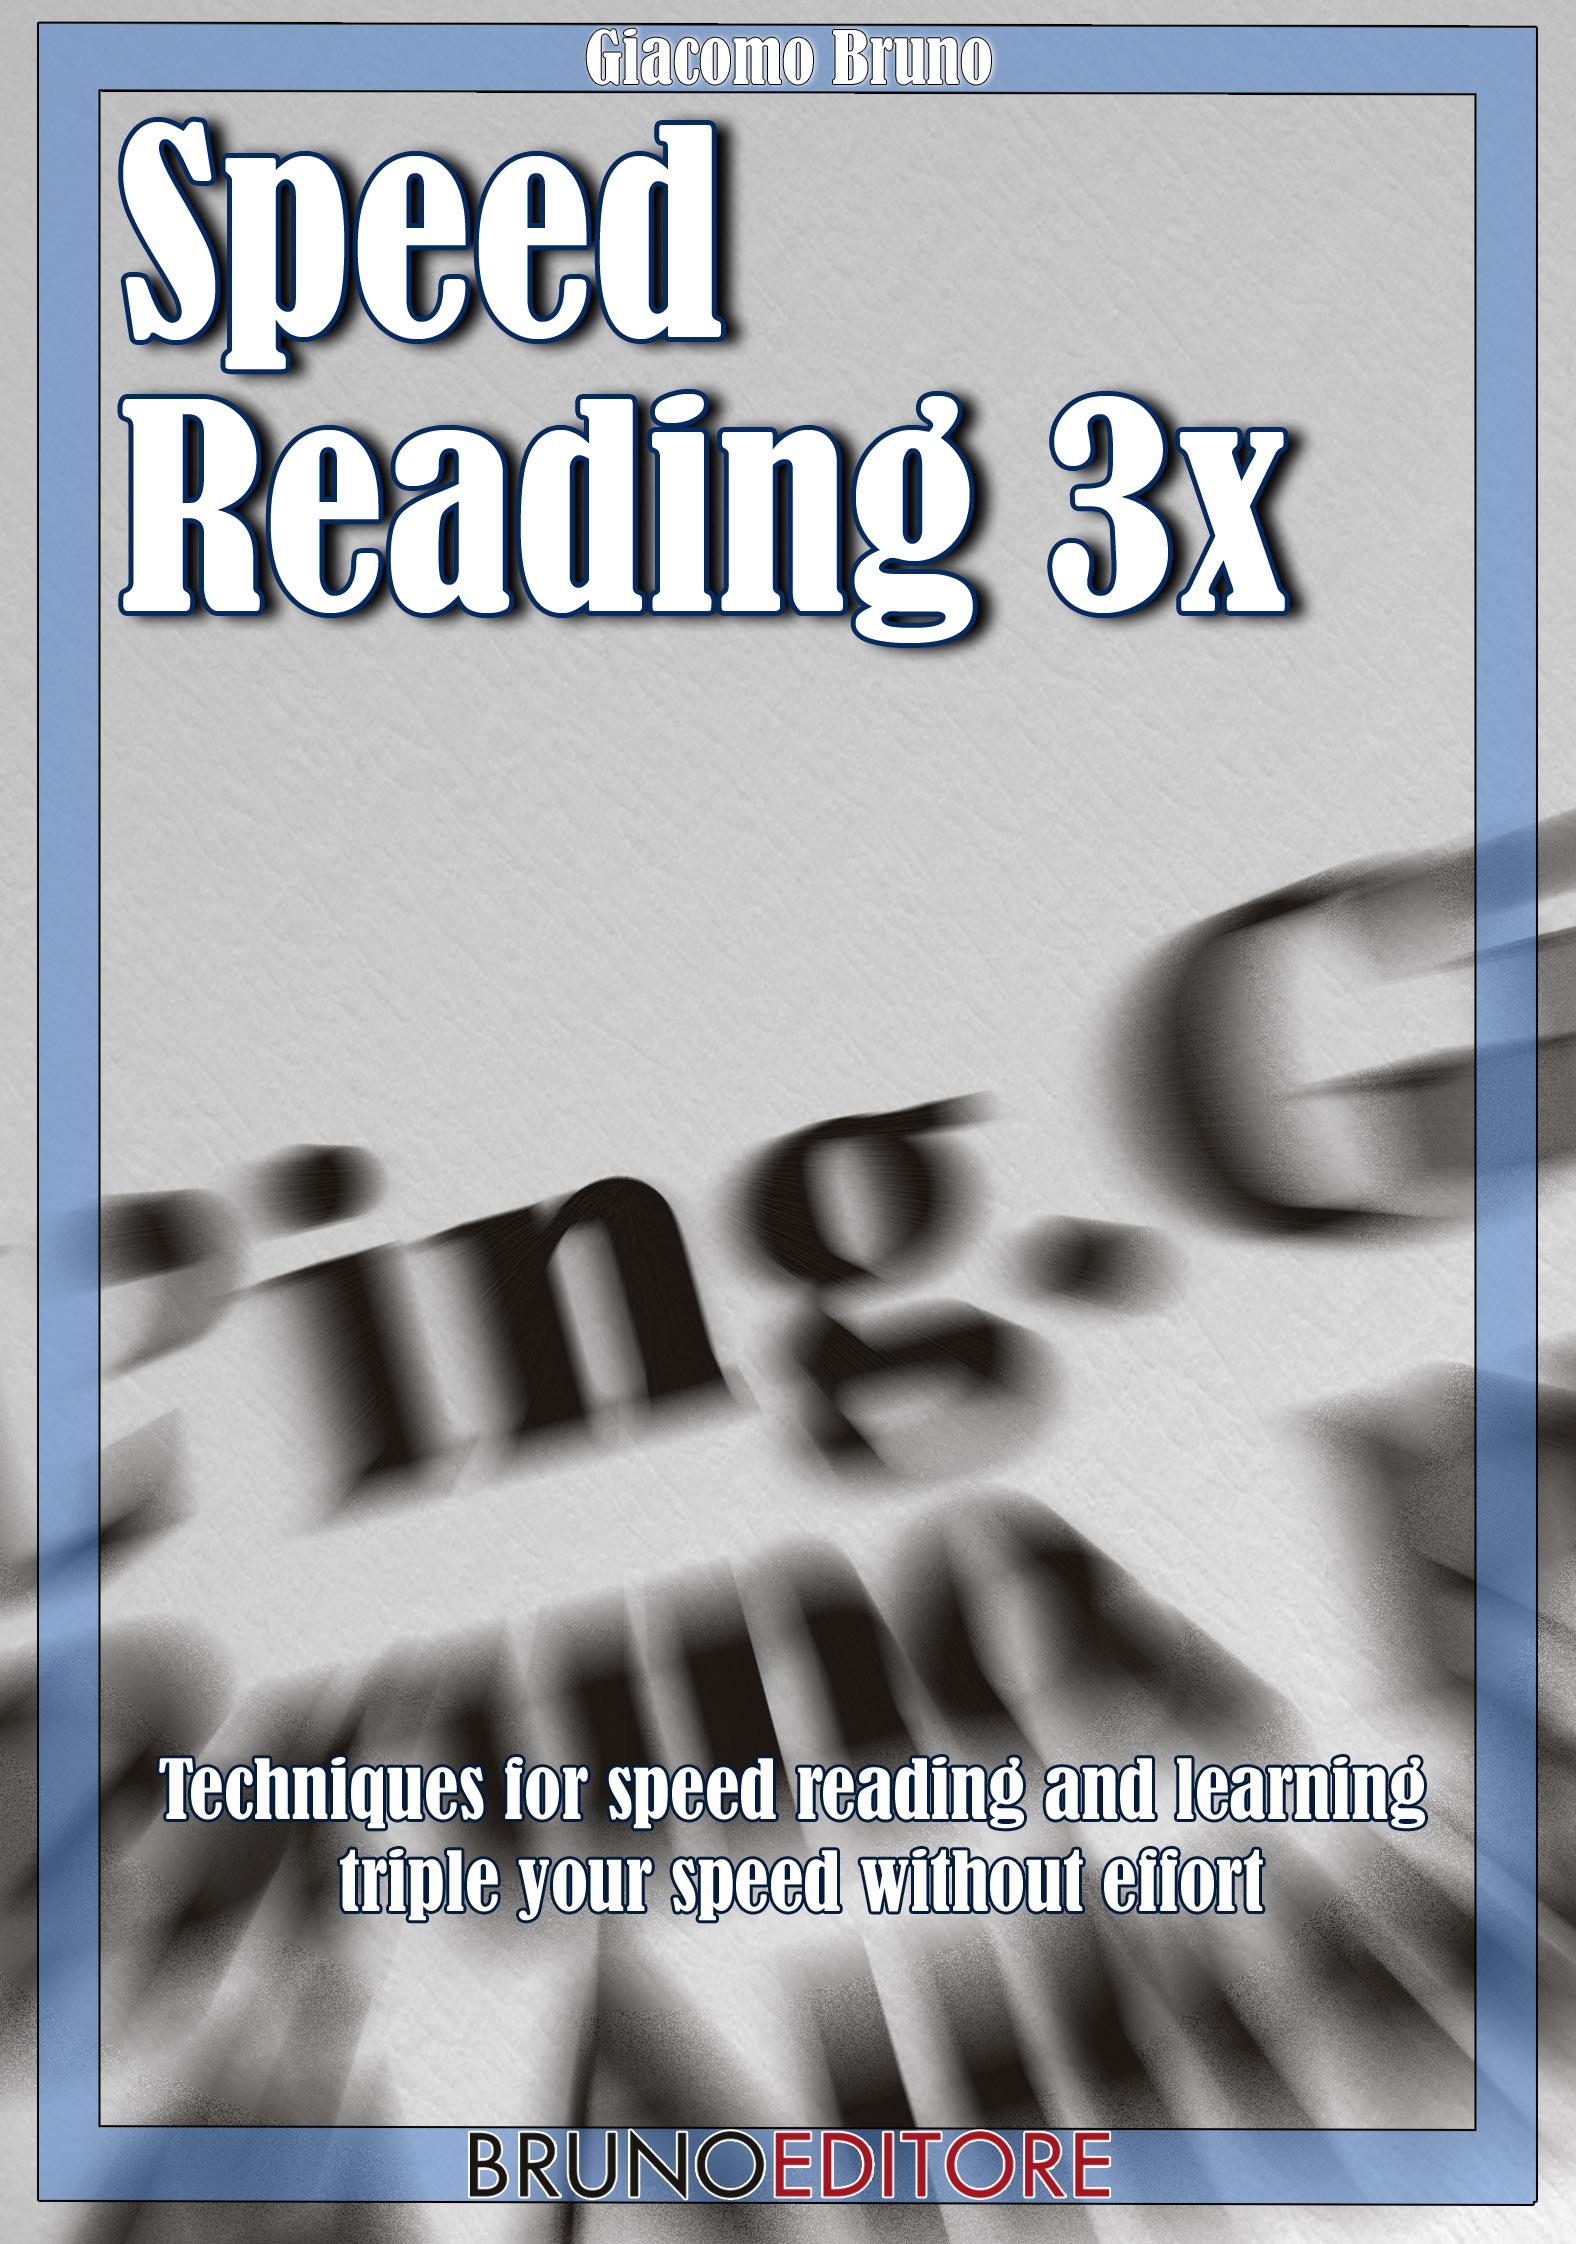 3x Speed Reading